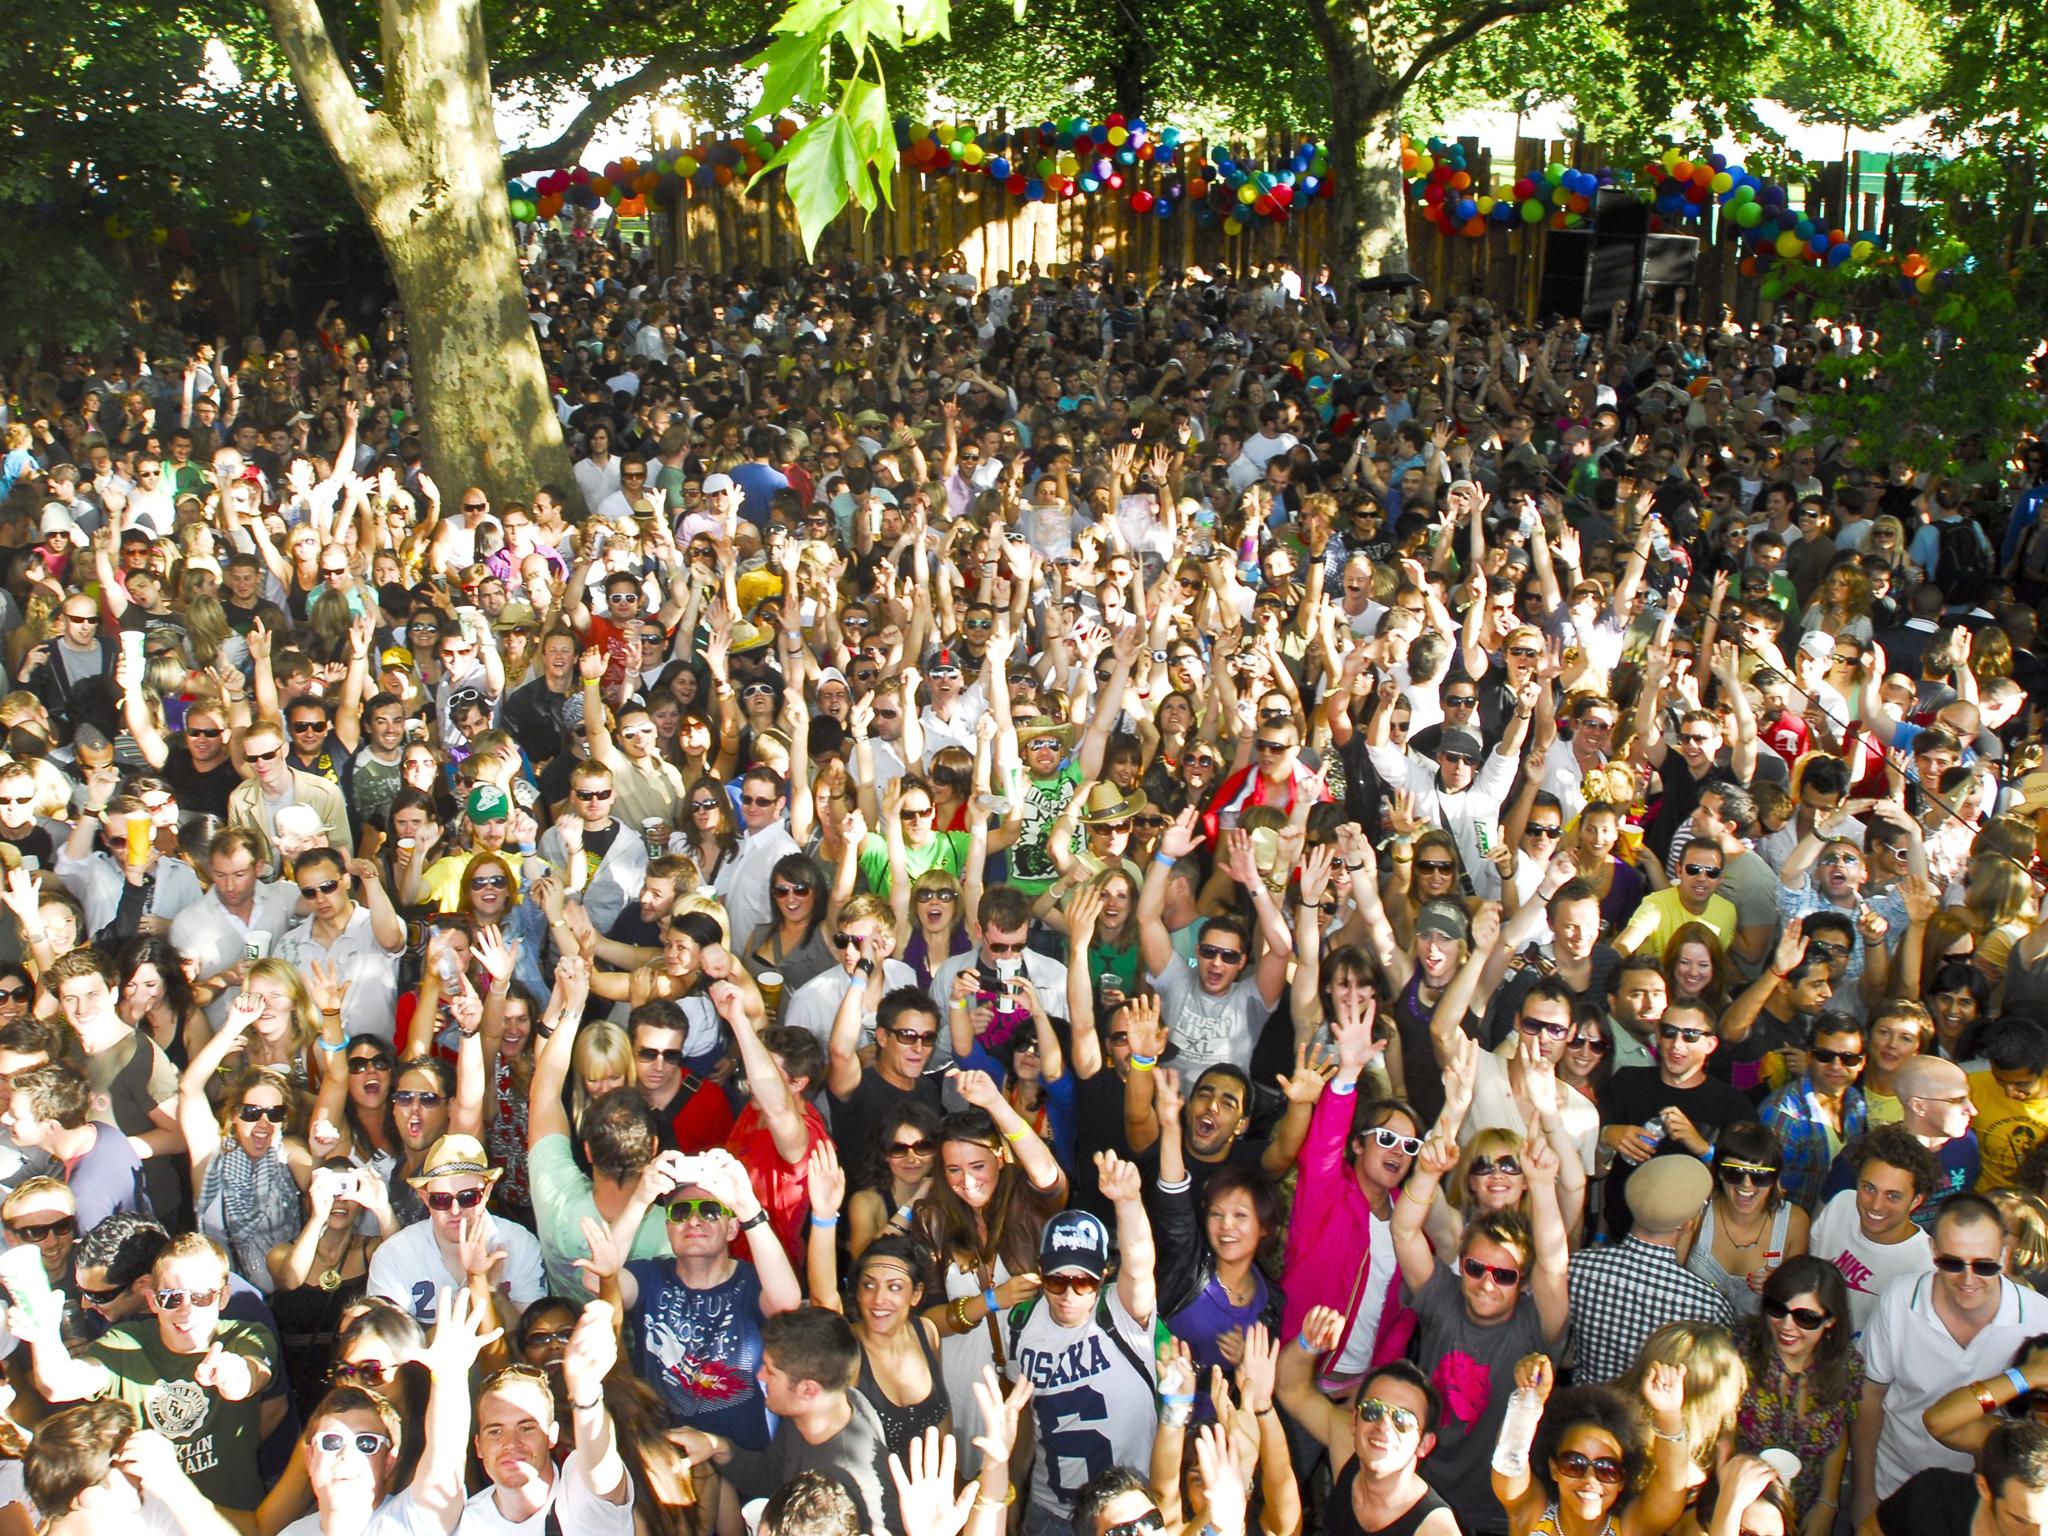 Win music festival tickets